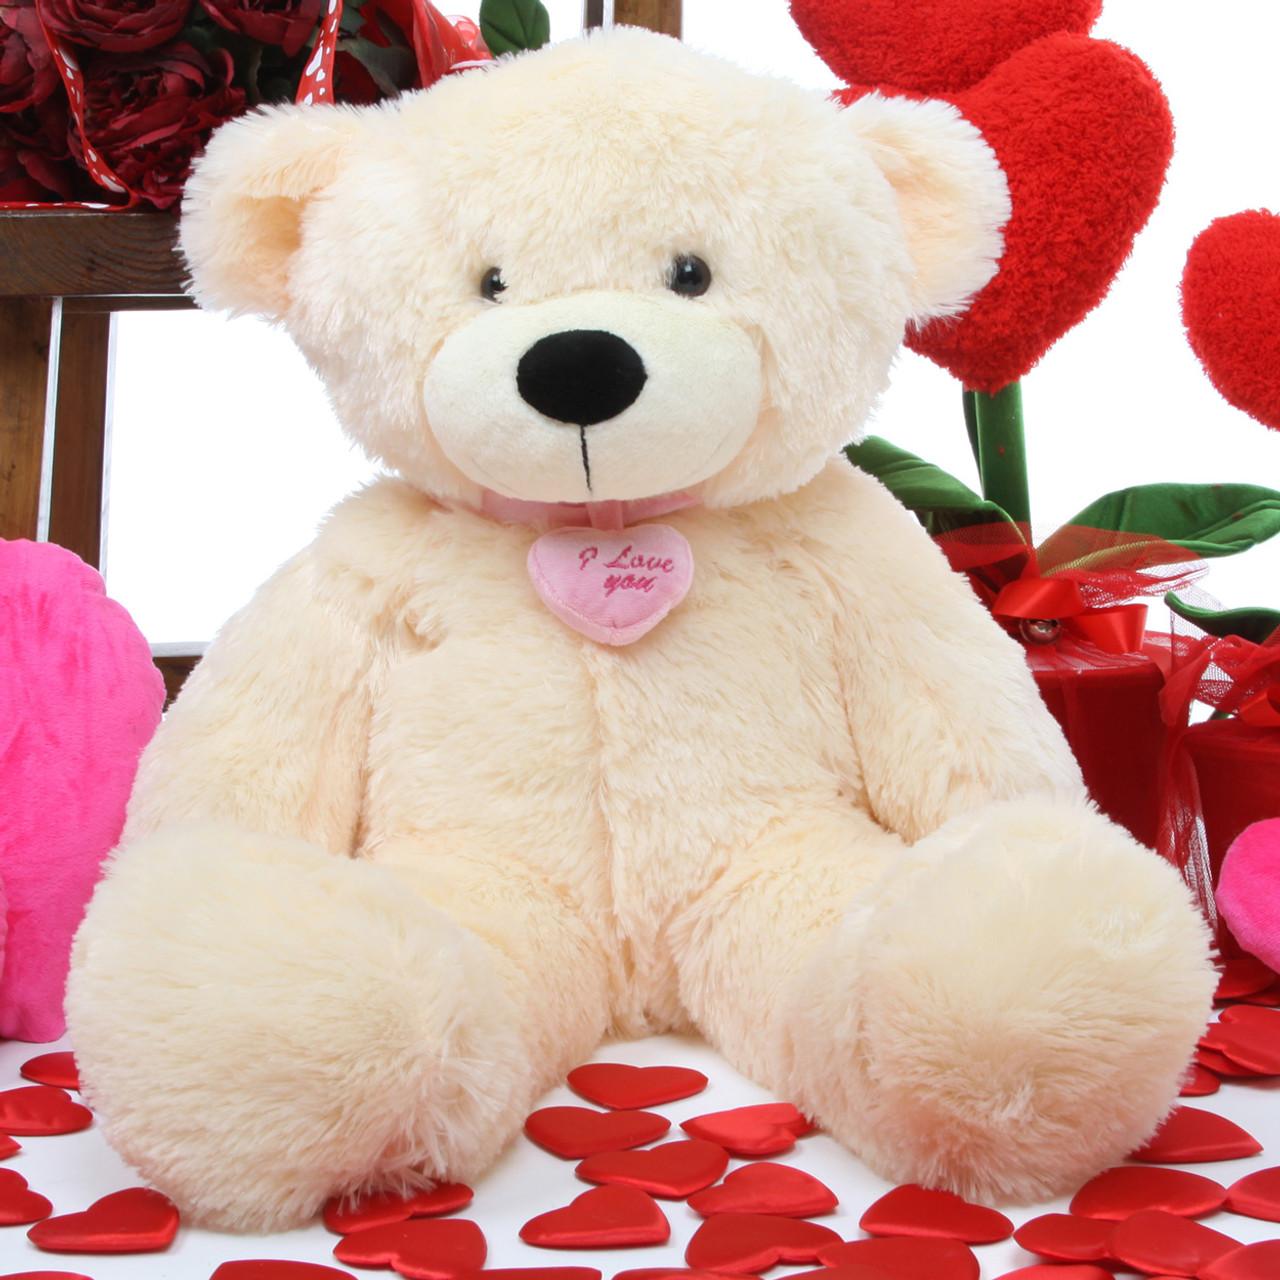 Cozy L Cuddles I Love You Necklace Cream Teddy Bear 24in